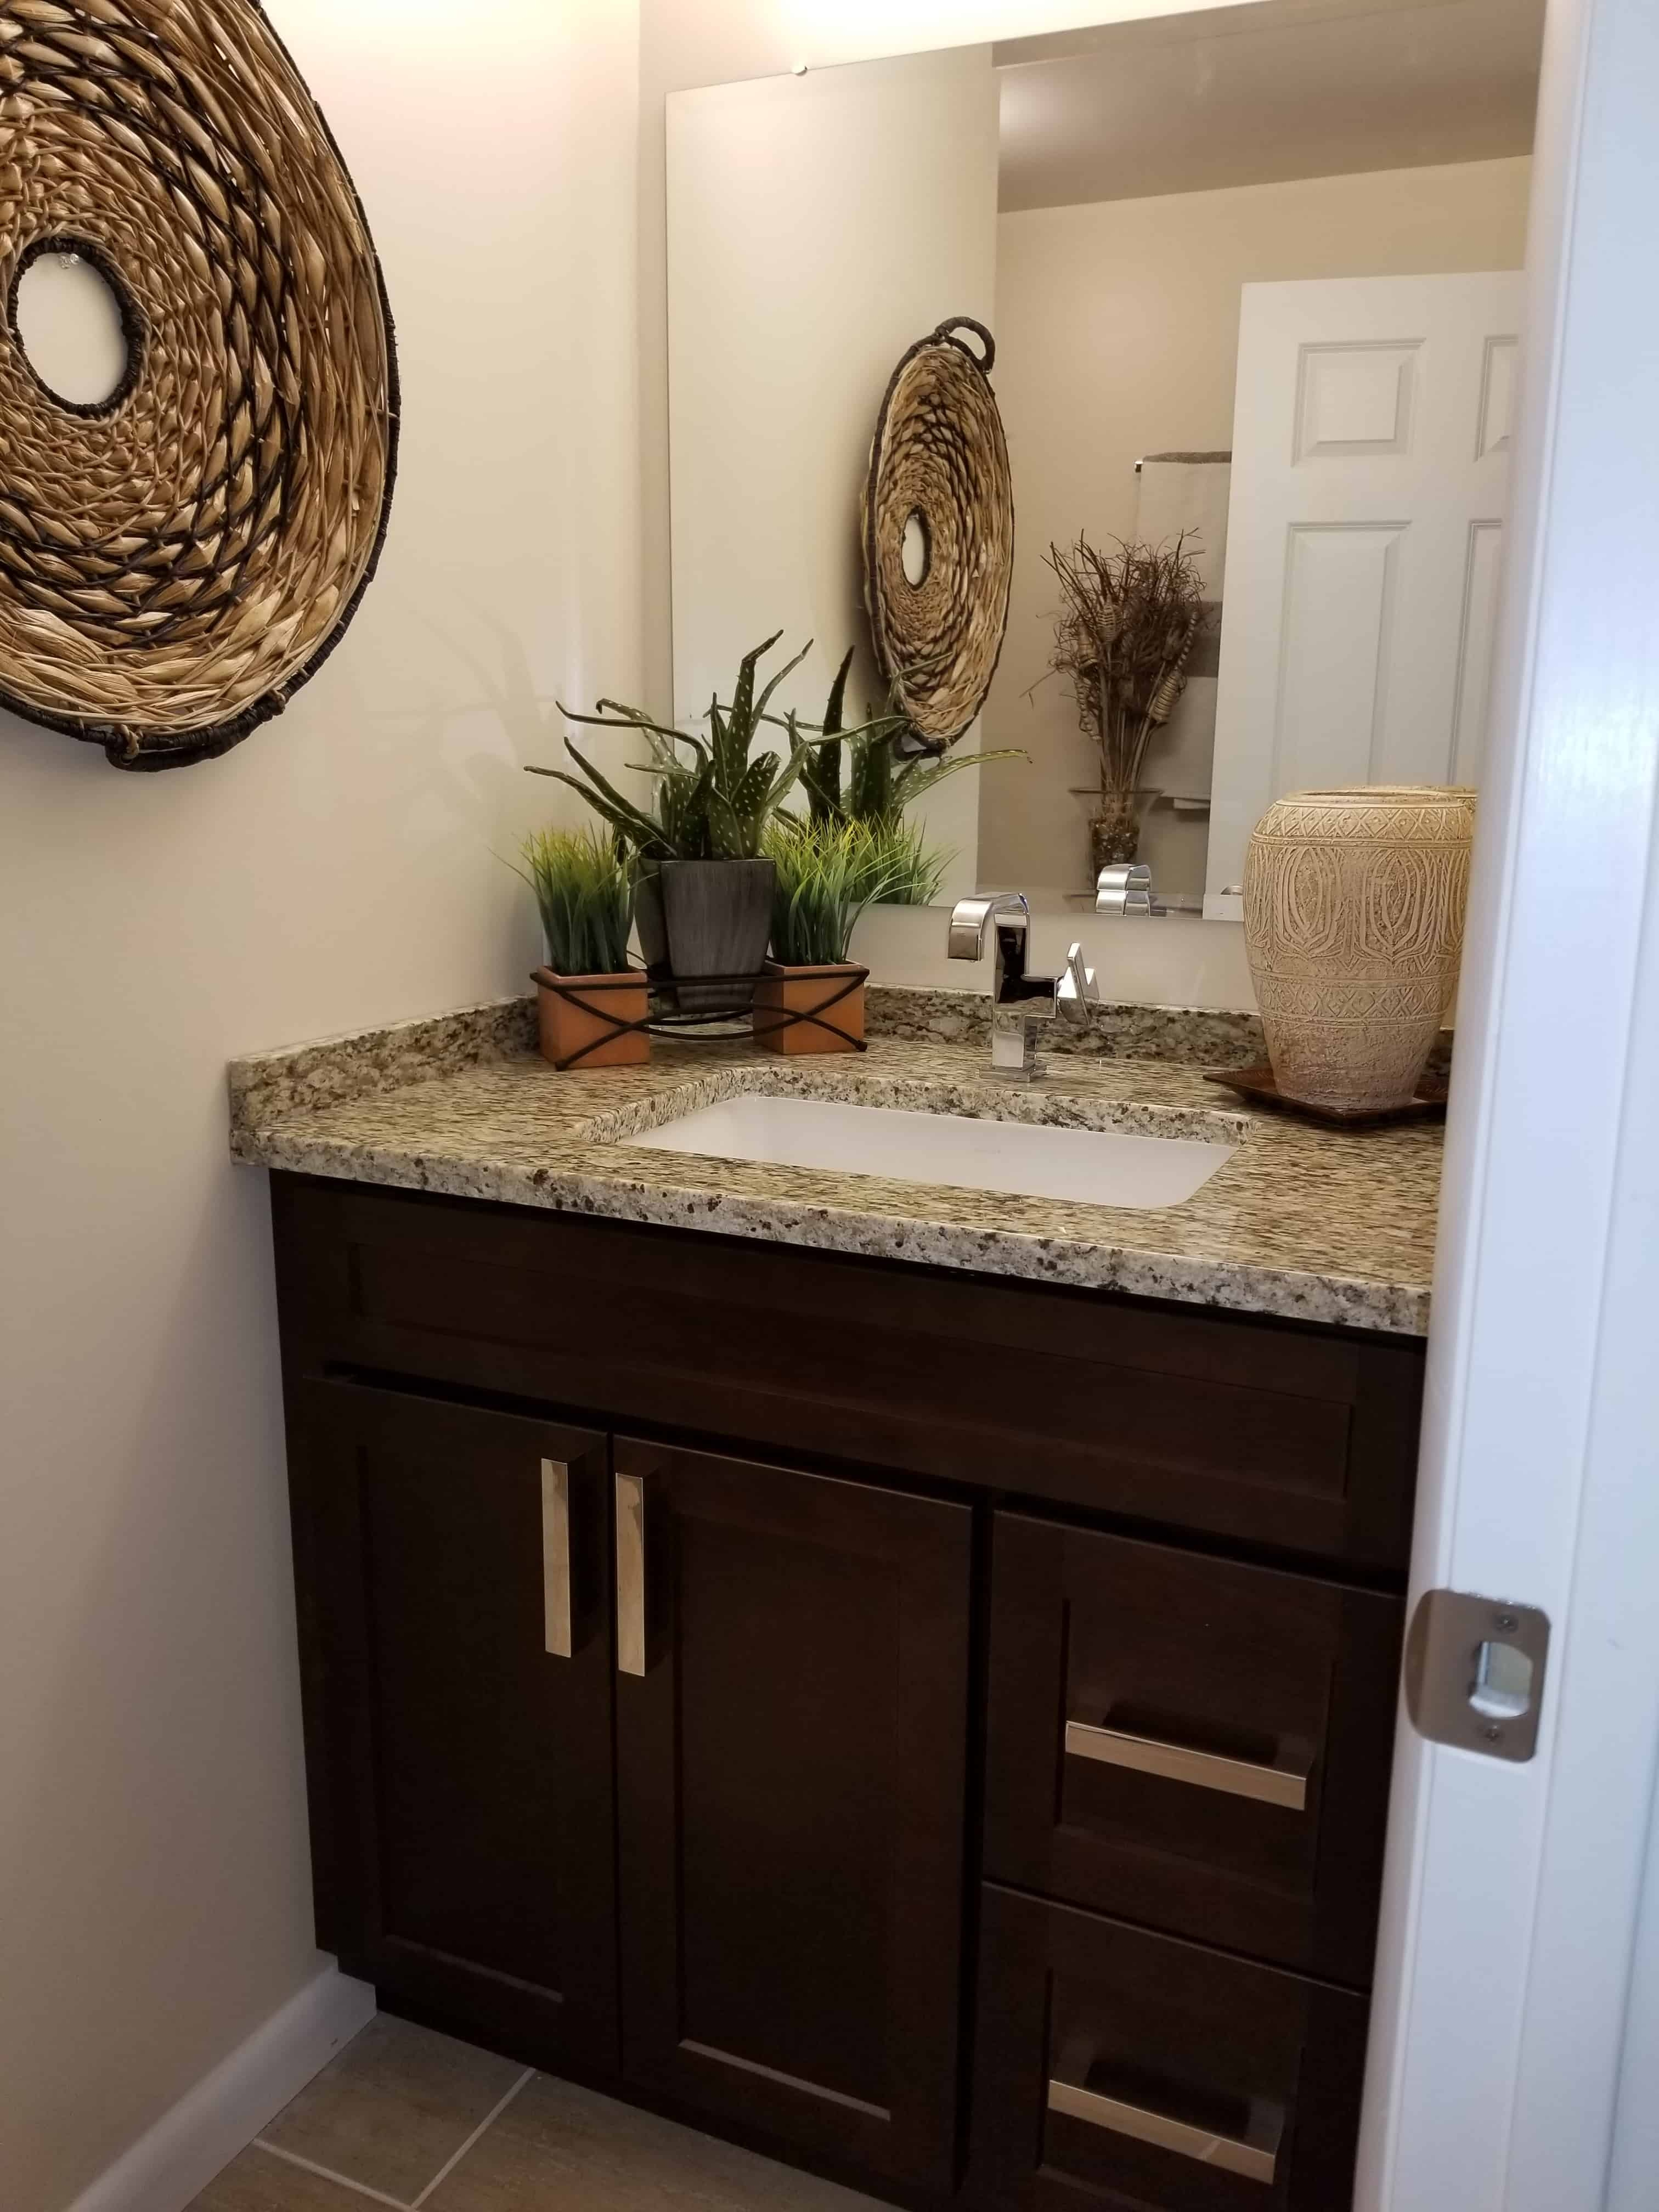 https://0201.nccdn.net/1_2/000/000/15e/2f2/BathroomSinkAndCabinet-min-3024x4032.jpg